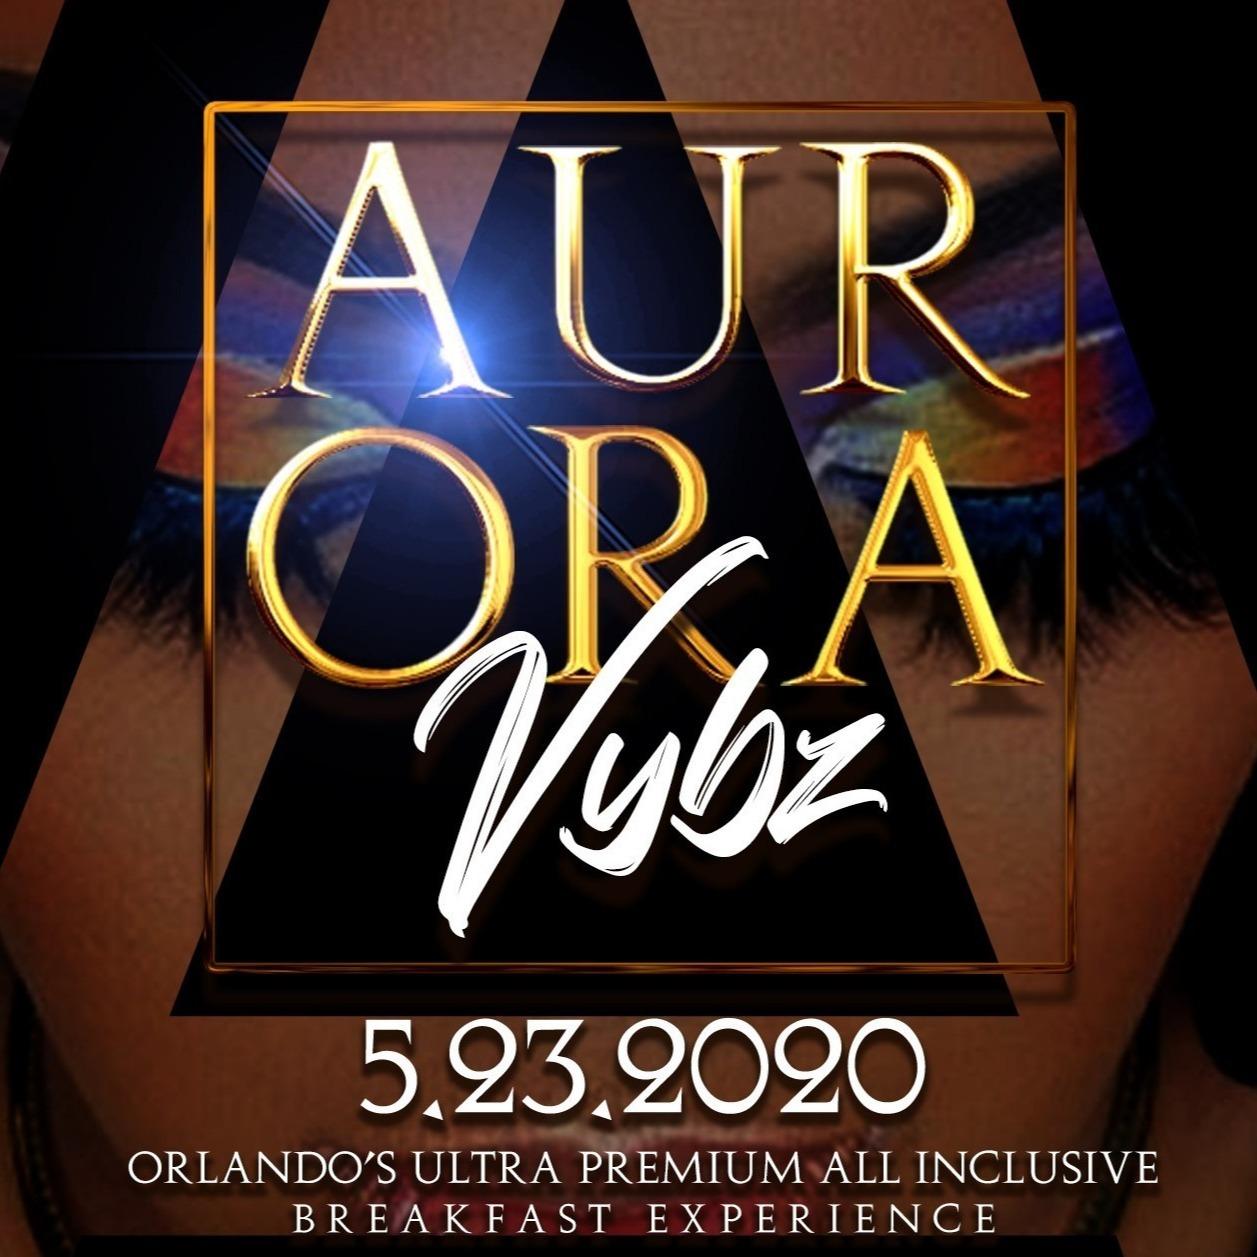 AURORA VYBZ ~ Orlando's Ultra Premium All Inclusive Breakfast Experience